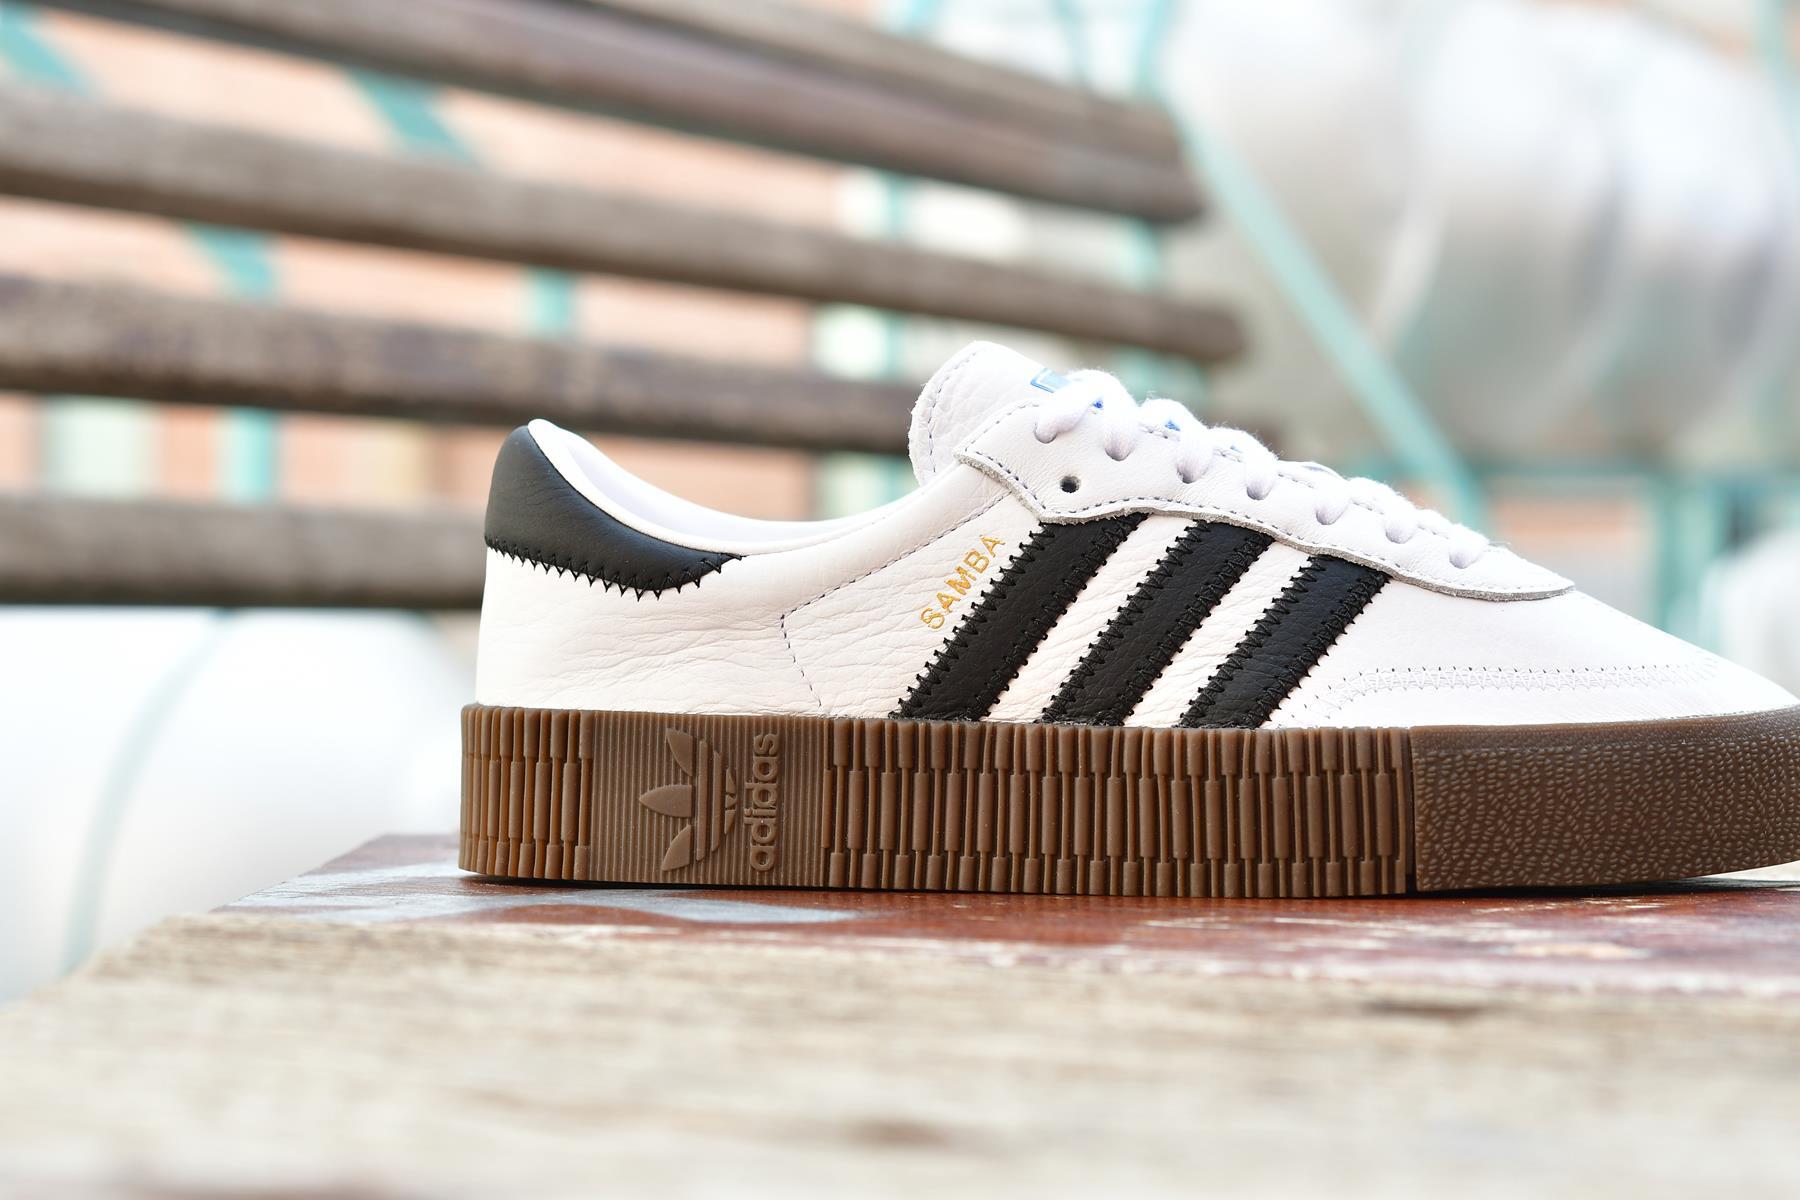 aq1134_AmorShoes-Adidas-Originals-Samba-Rose-W-Footwear-White-Core-Black-gum5--Blanca-Rayas-Negras-plataforma-suela-de-caramelo-aq1134